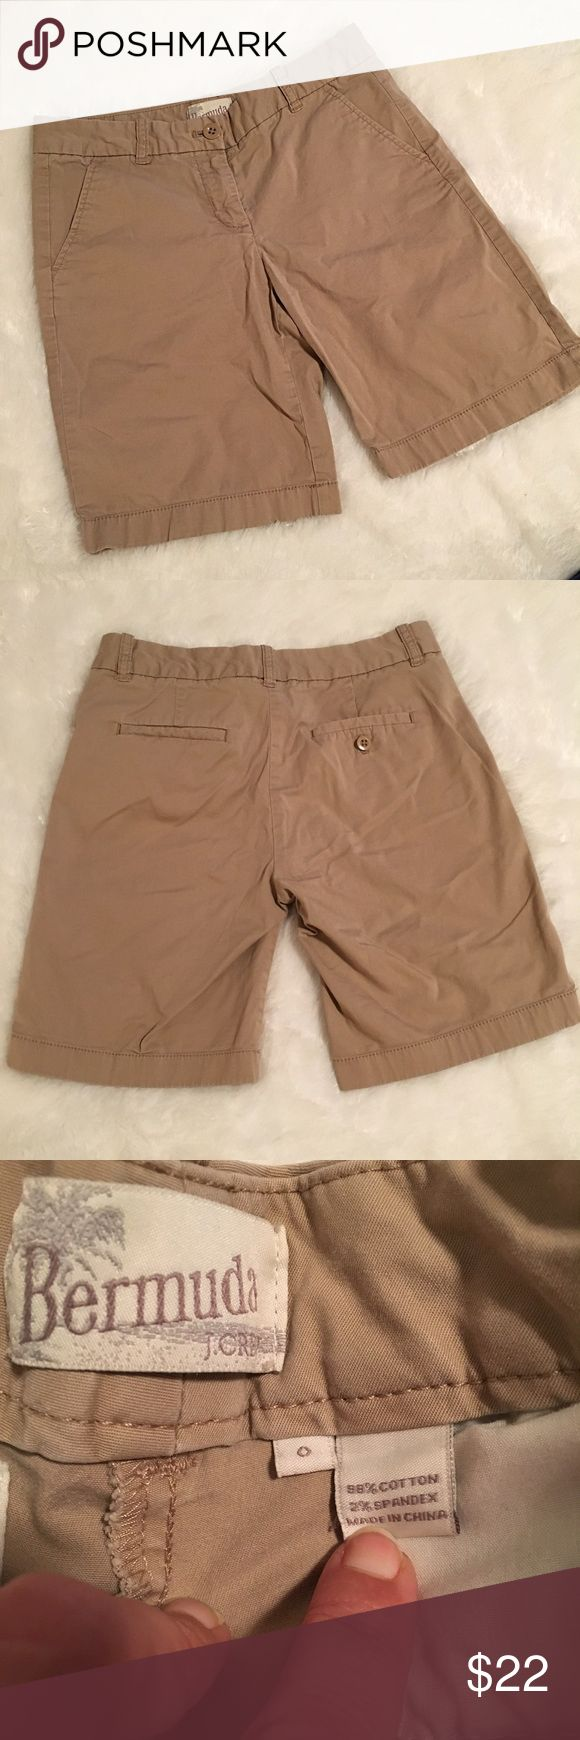 "🆕 J Crew Khaki Bermuda Shorts In great preloved condition. J Crew Khaki Bermuda Shorts. Size 0. 98% cotton, 2% spandex. Waist 14"", rise 8"", inseam 8.5"". ❌NO TRADES❌NO LOWBALLING ❌NO MODELING❌ J. Crew Shorts Bermudas"